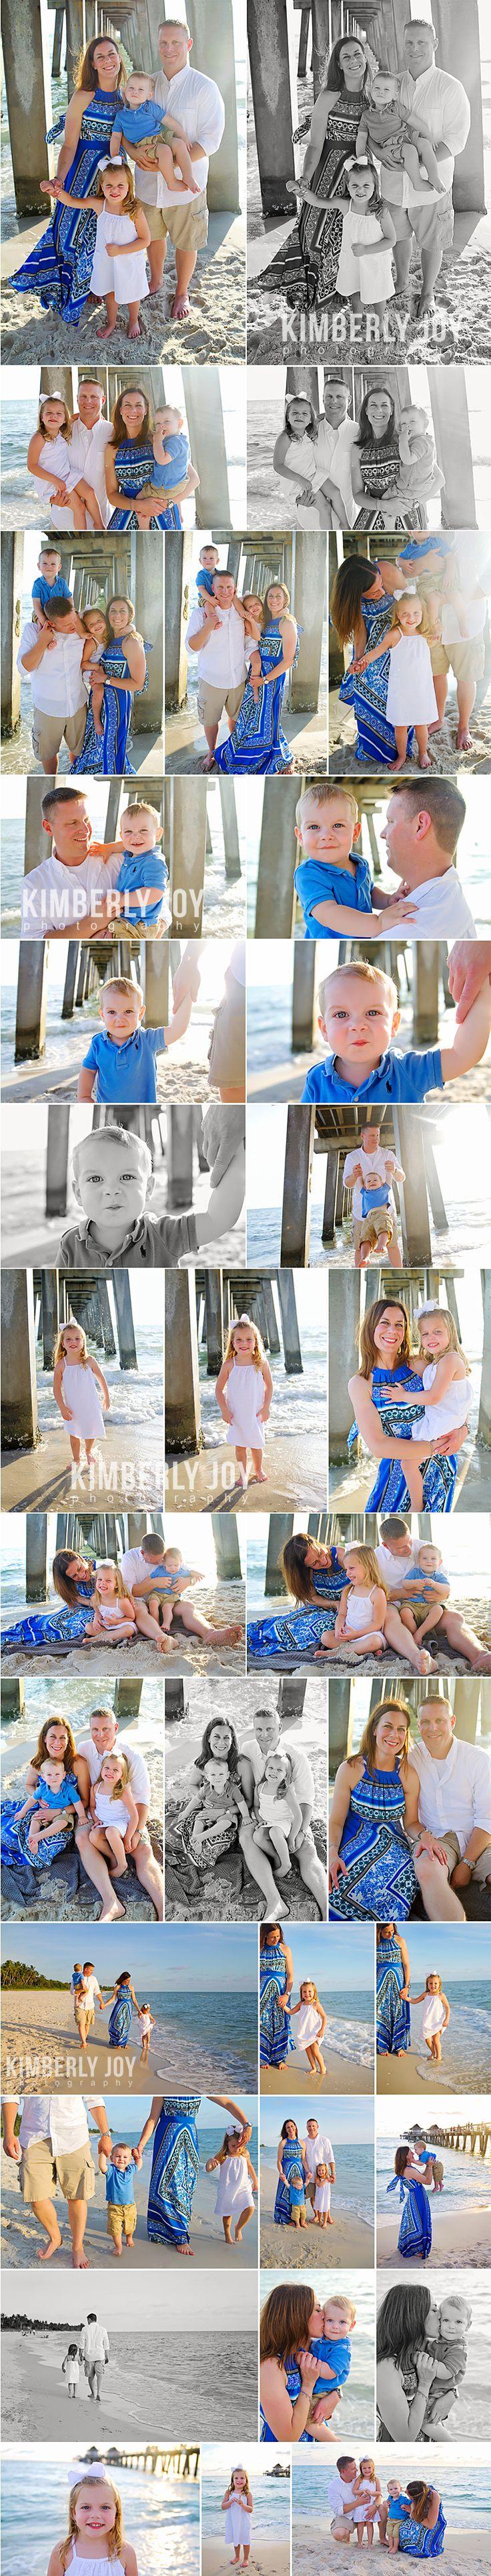 Kimberly-Alegria-Photography-Beach-Família-Session-Kids-Children-fotógrafo-Nápoles-Florida-Pier-BeachPhotos-Minis-MS2